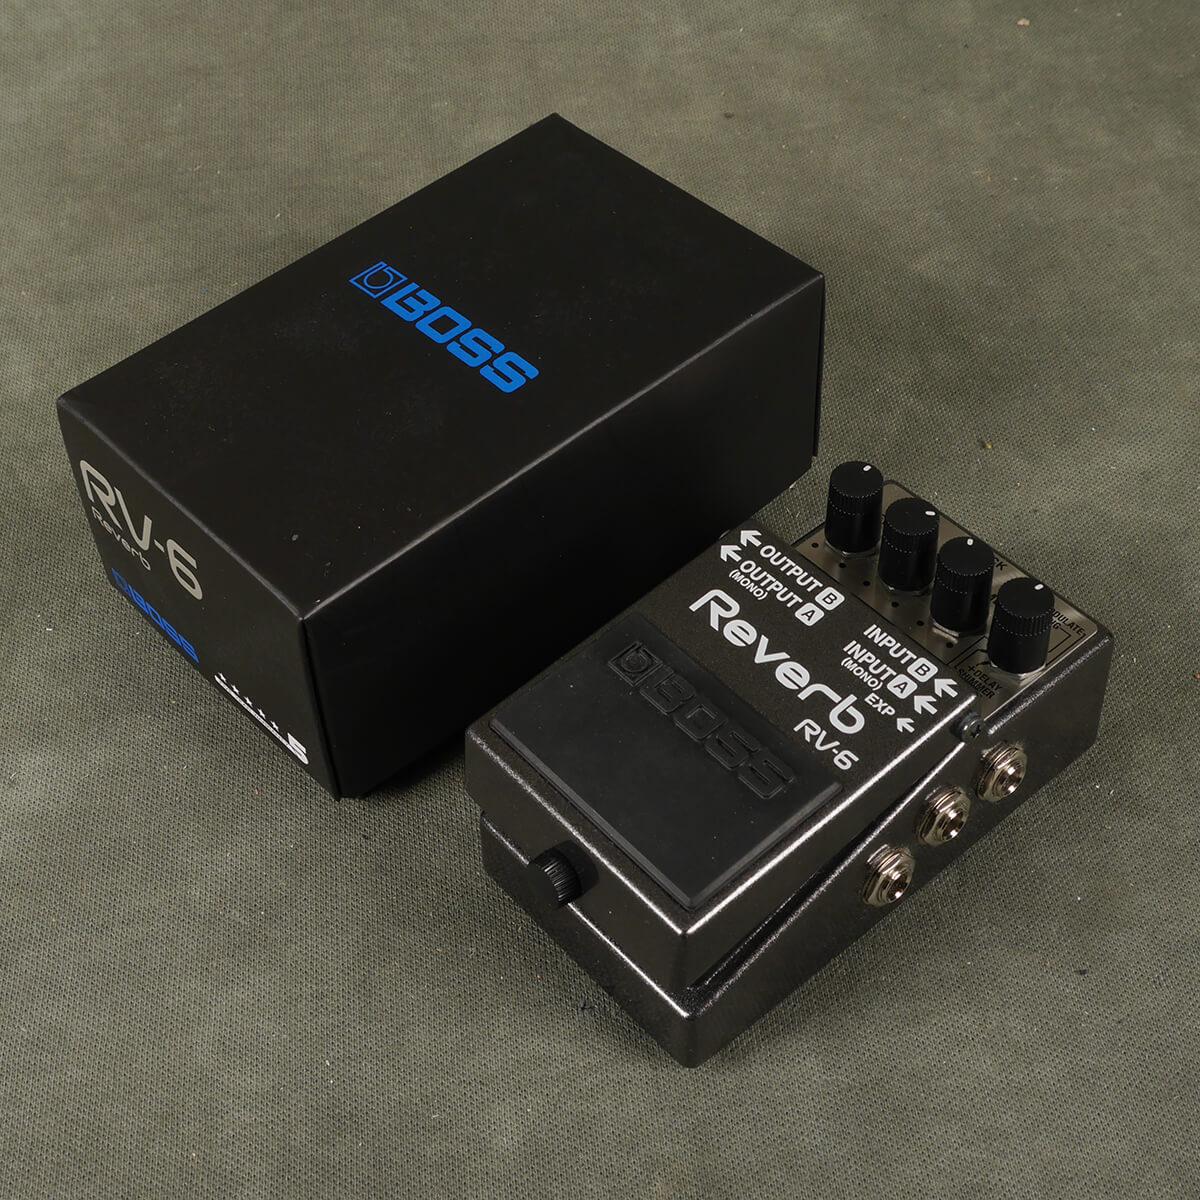 Boss RV-6 Reverb FX Pedal w/Box - 2nd Hand